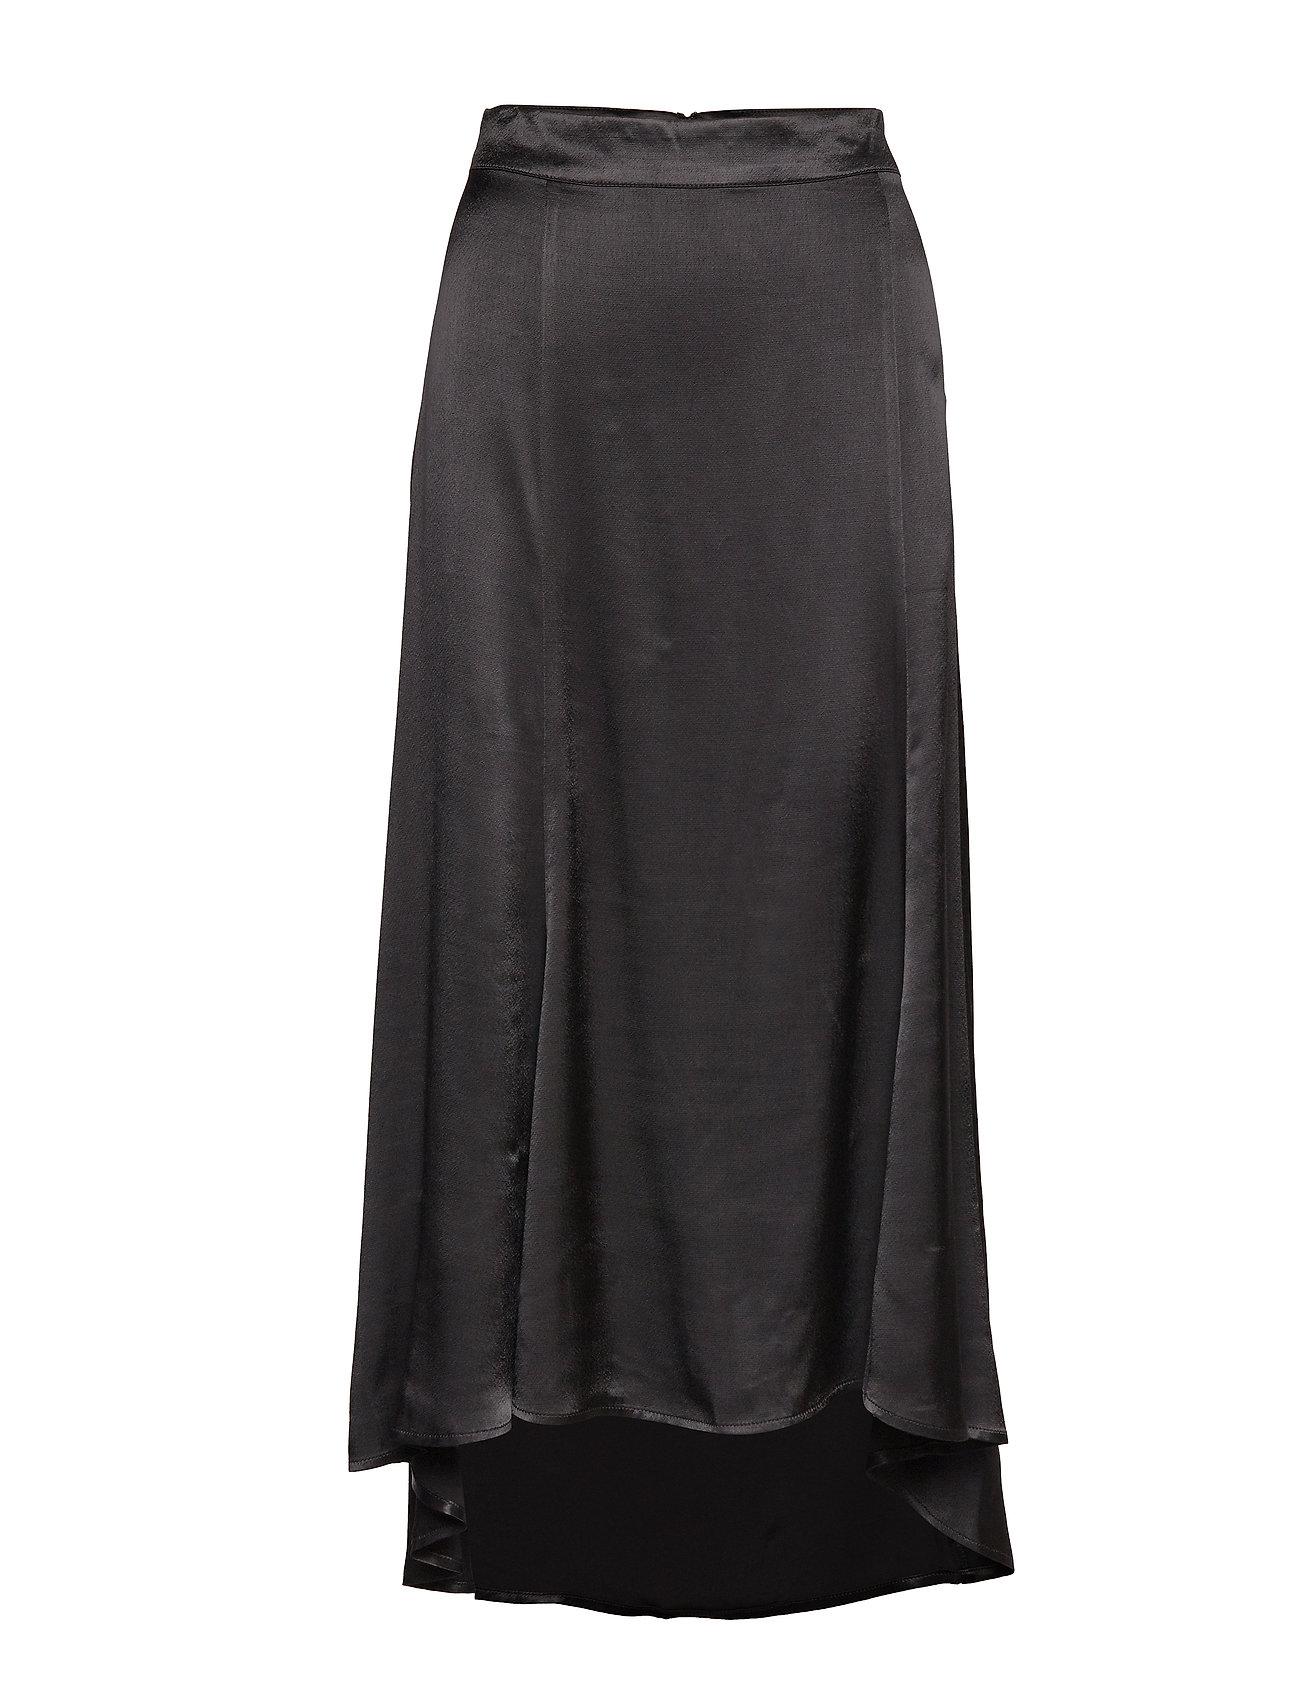 Soft Rebels Darling Skirt - BLACK